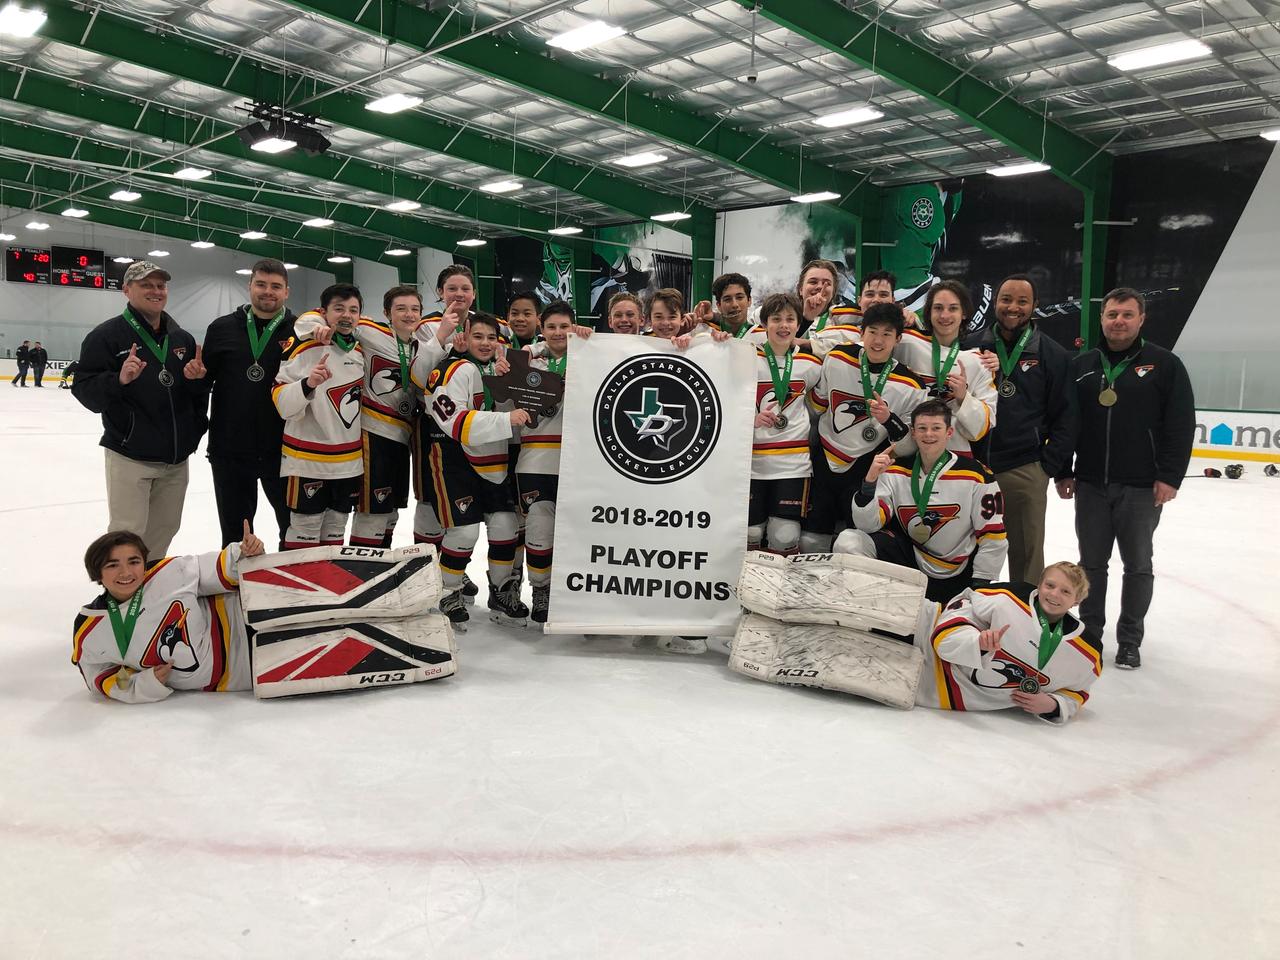 2019 Dsthl 14u A Playoff Champions Dallas Stars Travel Hockey League